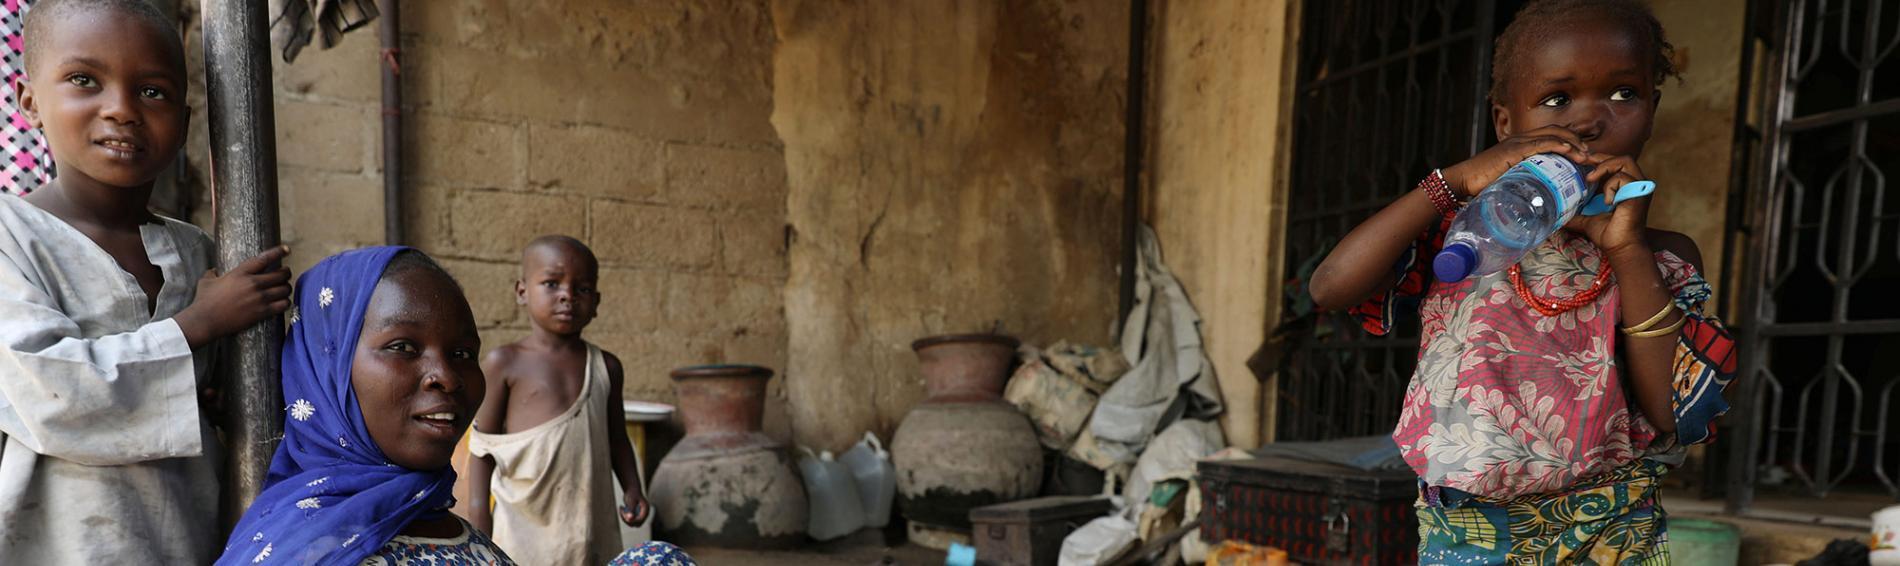 Nigeria: Viele Kinder sind mangelernährt. Foto: Reuters